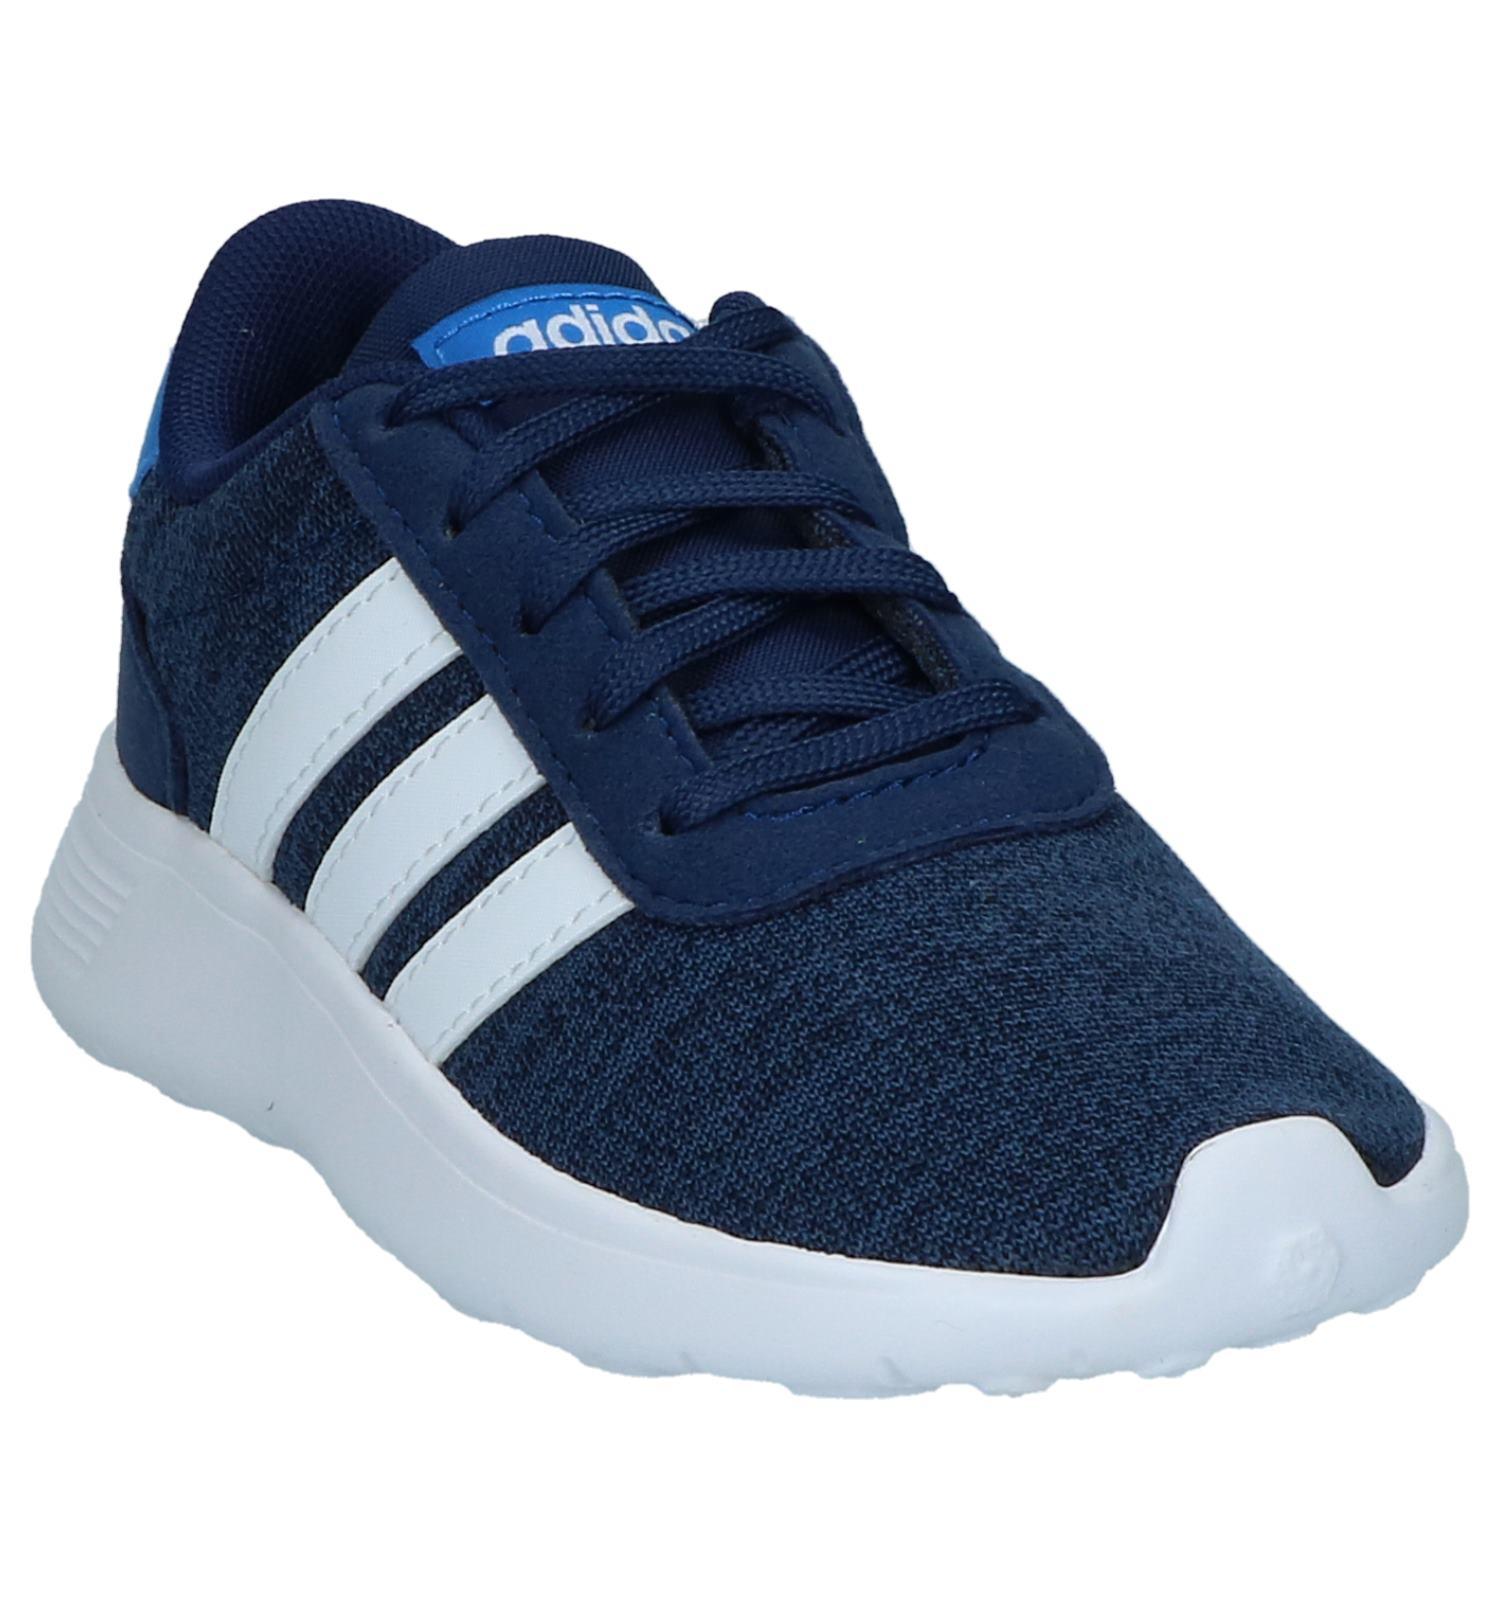 adidas Lite Racer K Blauwe Sneakers | TORFS.BE | Gratis verzend en retour